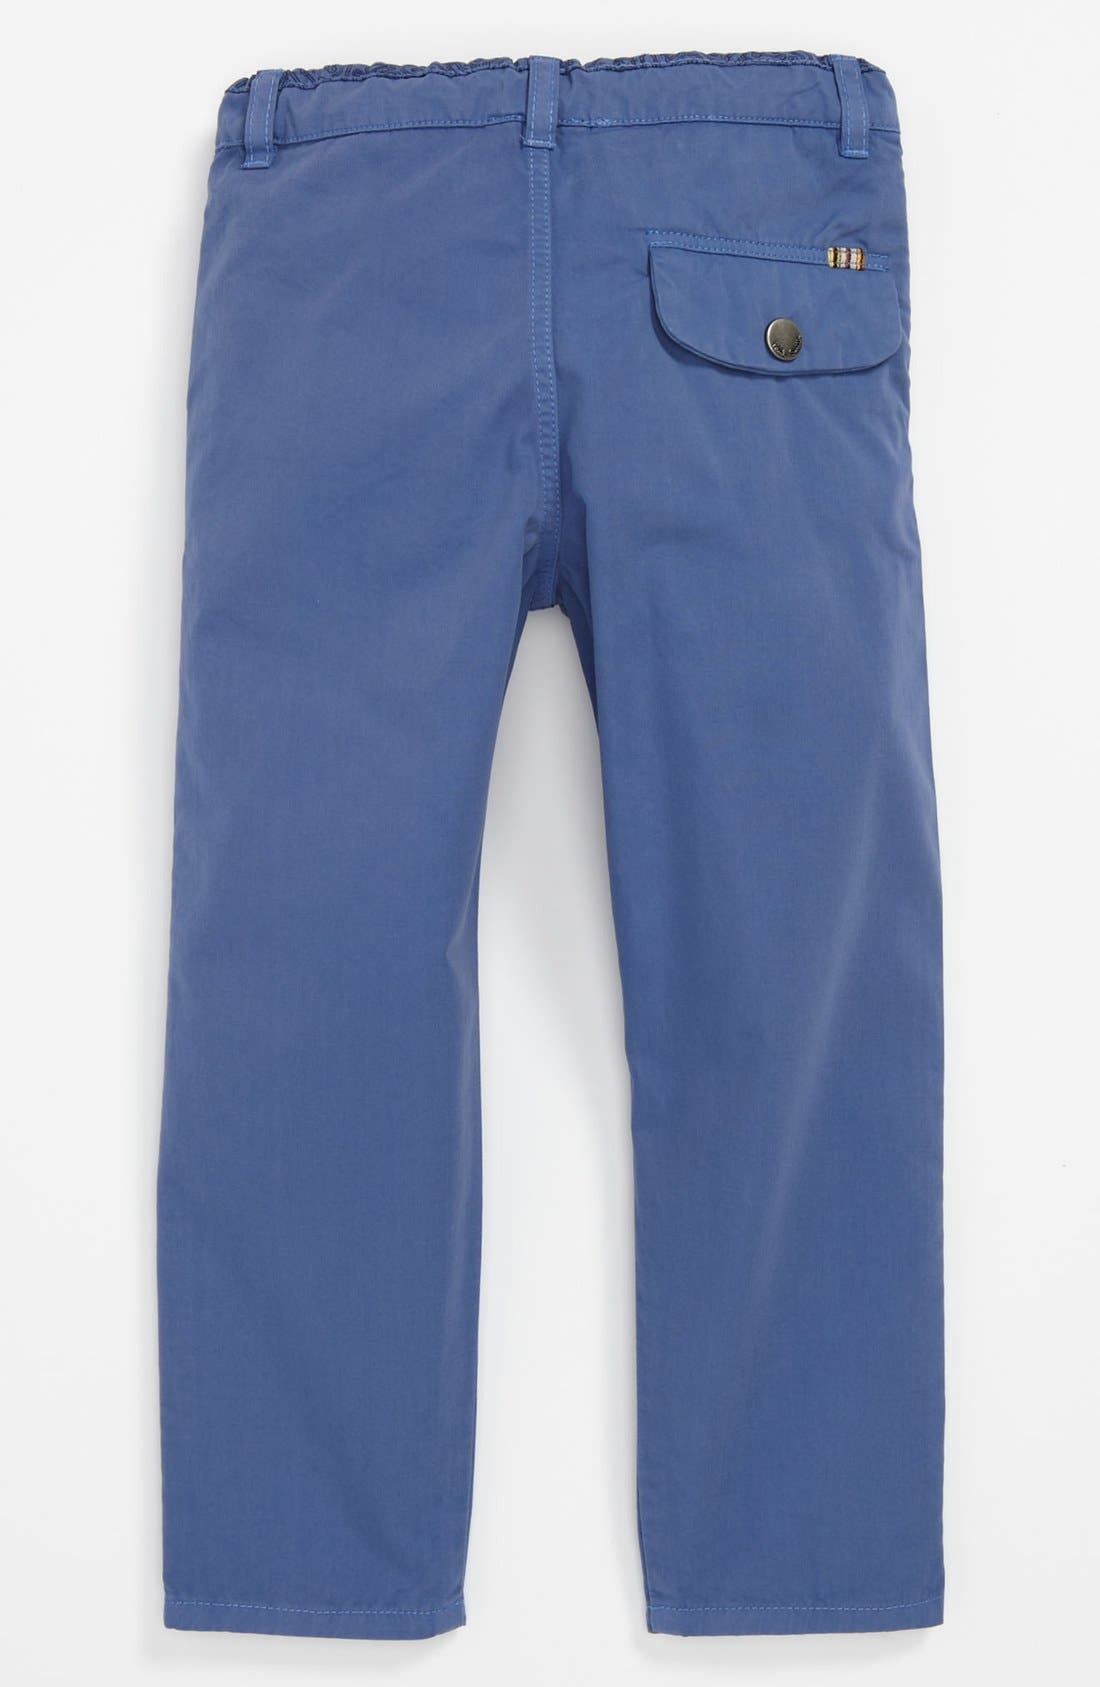 Alternate Image 1 Selected - Paul Smith Junior Denim Pants (Baby)